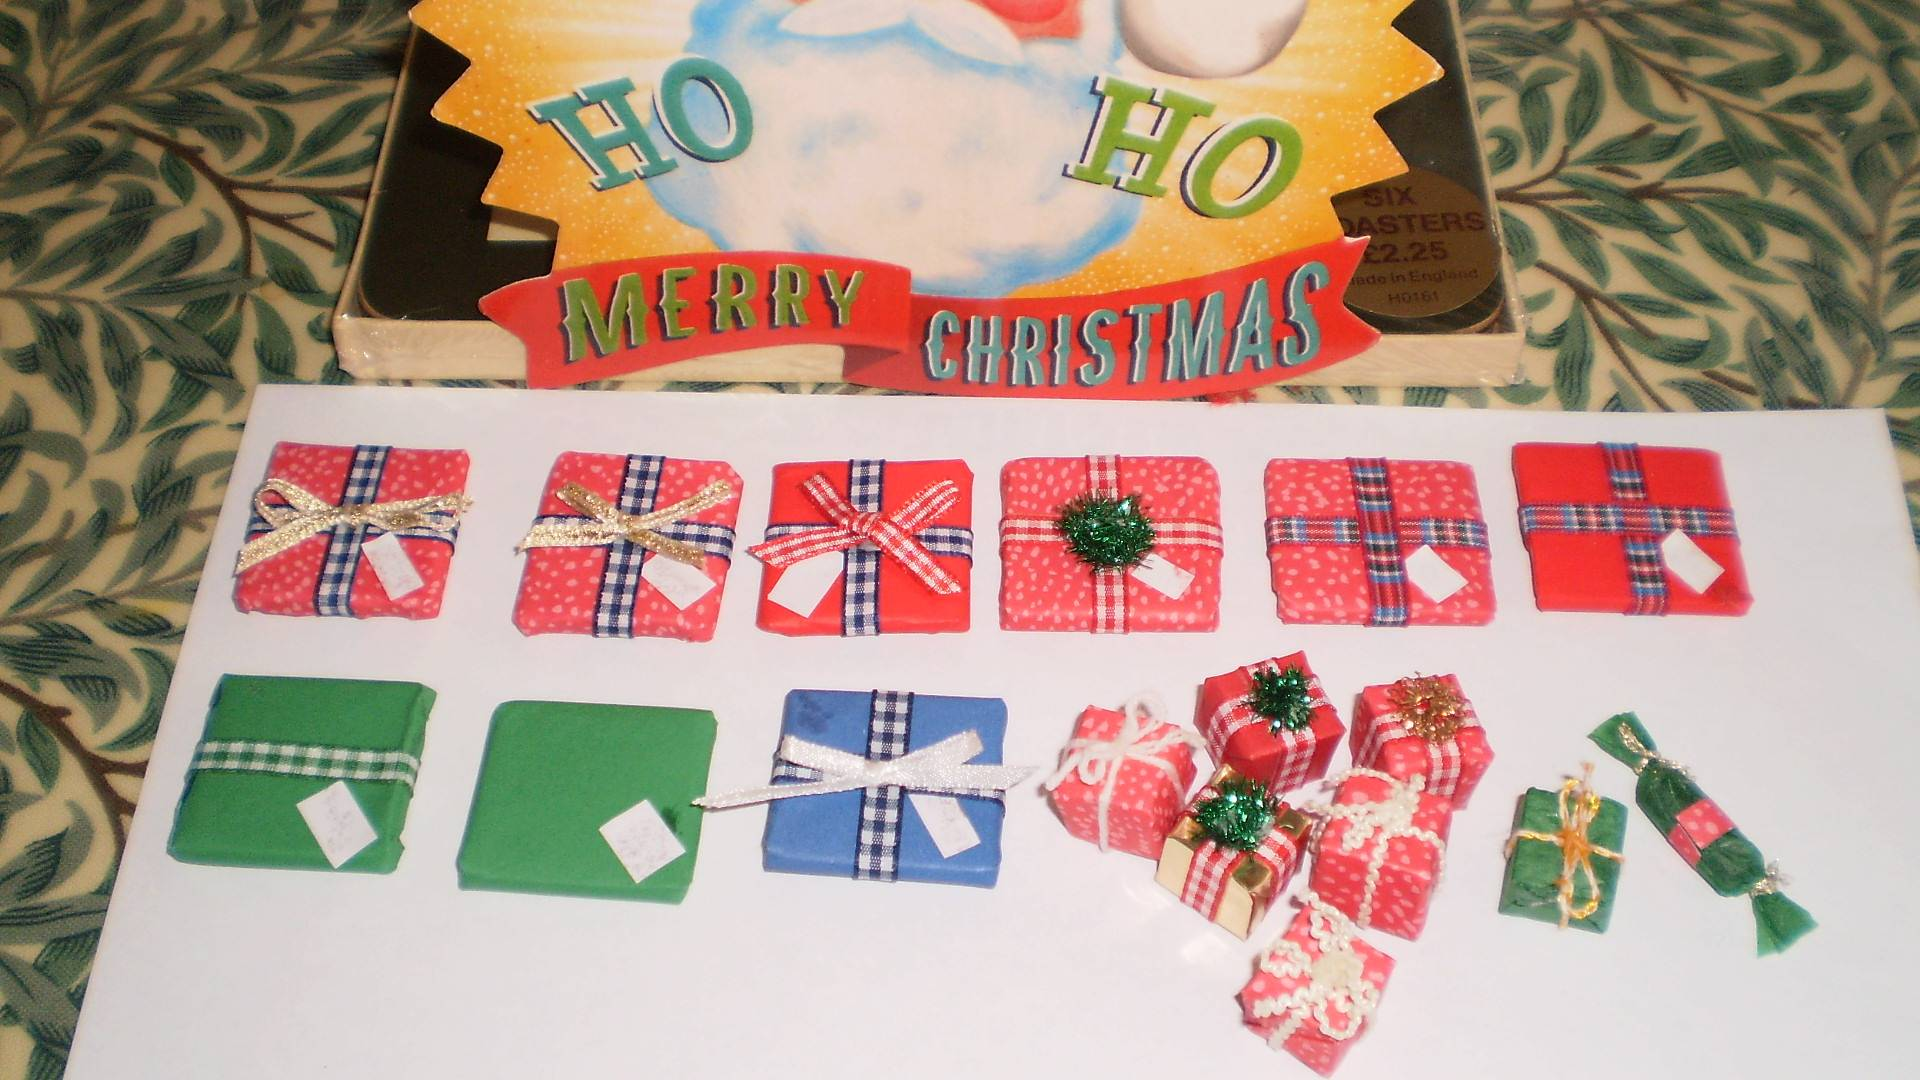 More Christmas parcels!